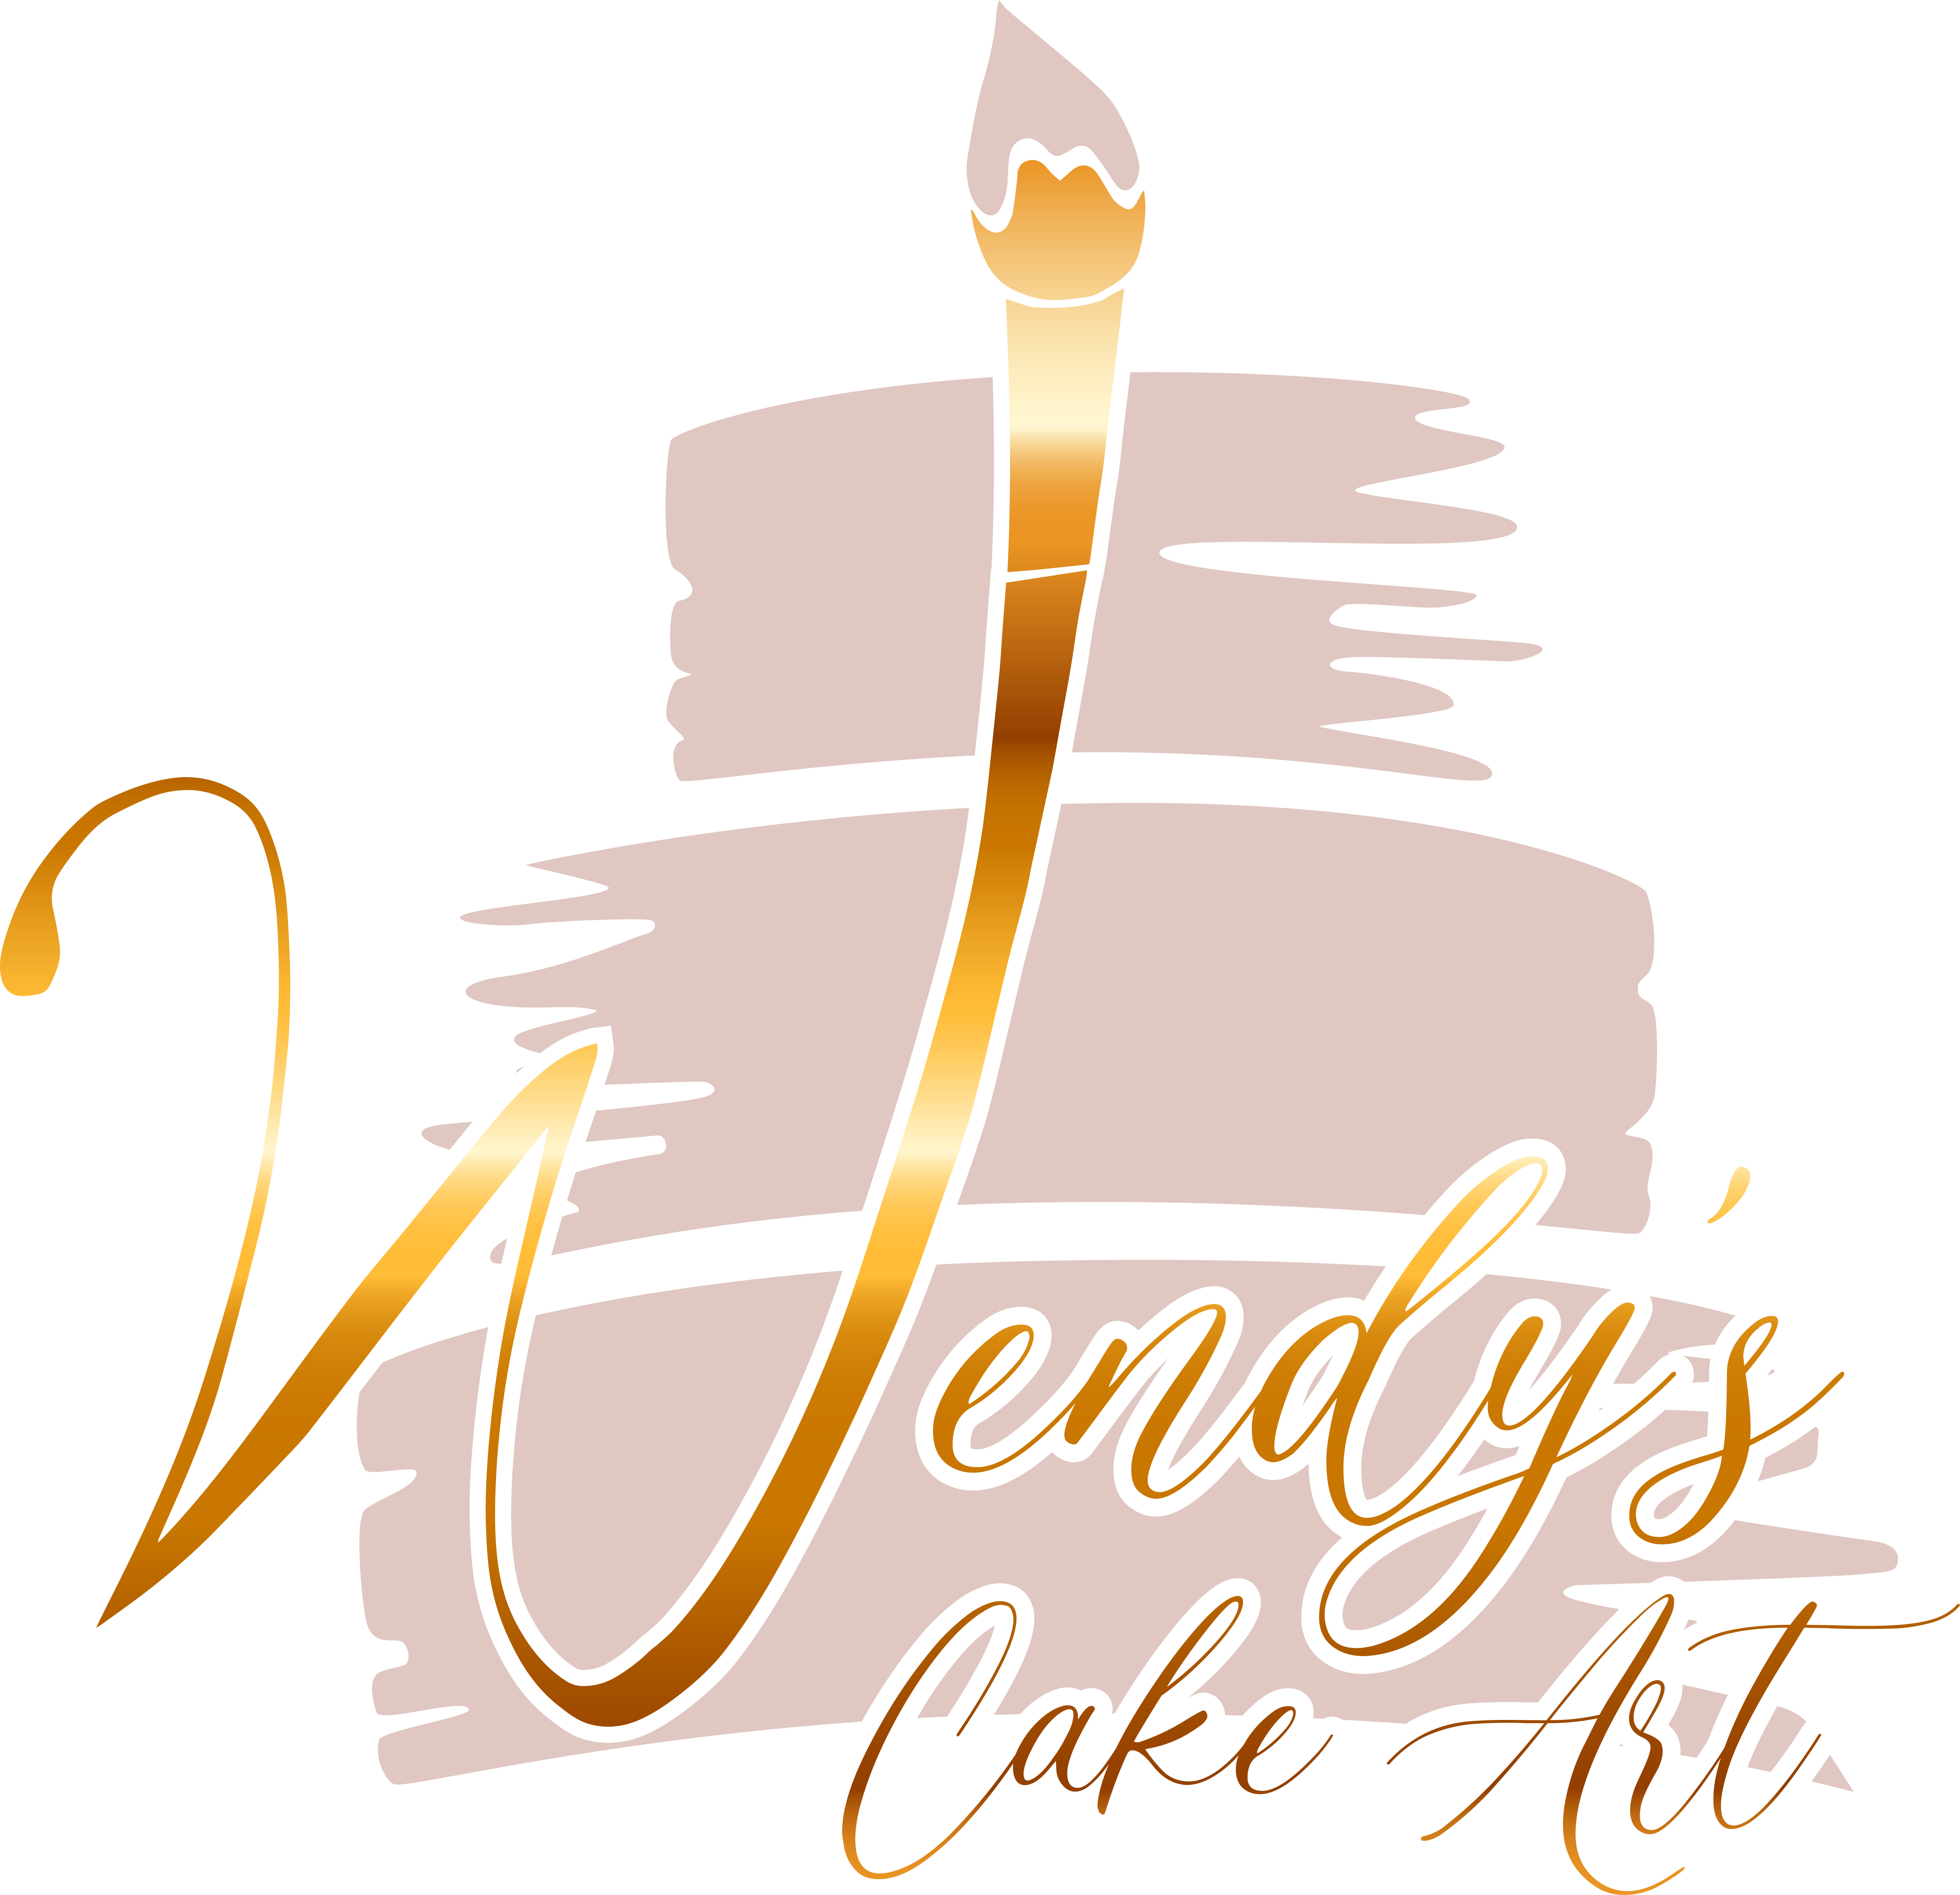 Wendy's Cake Art logo